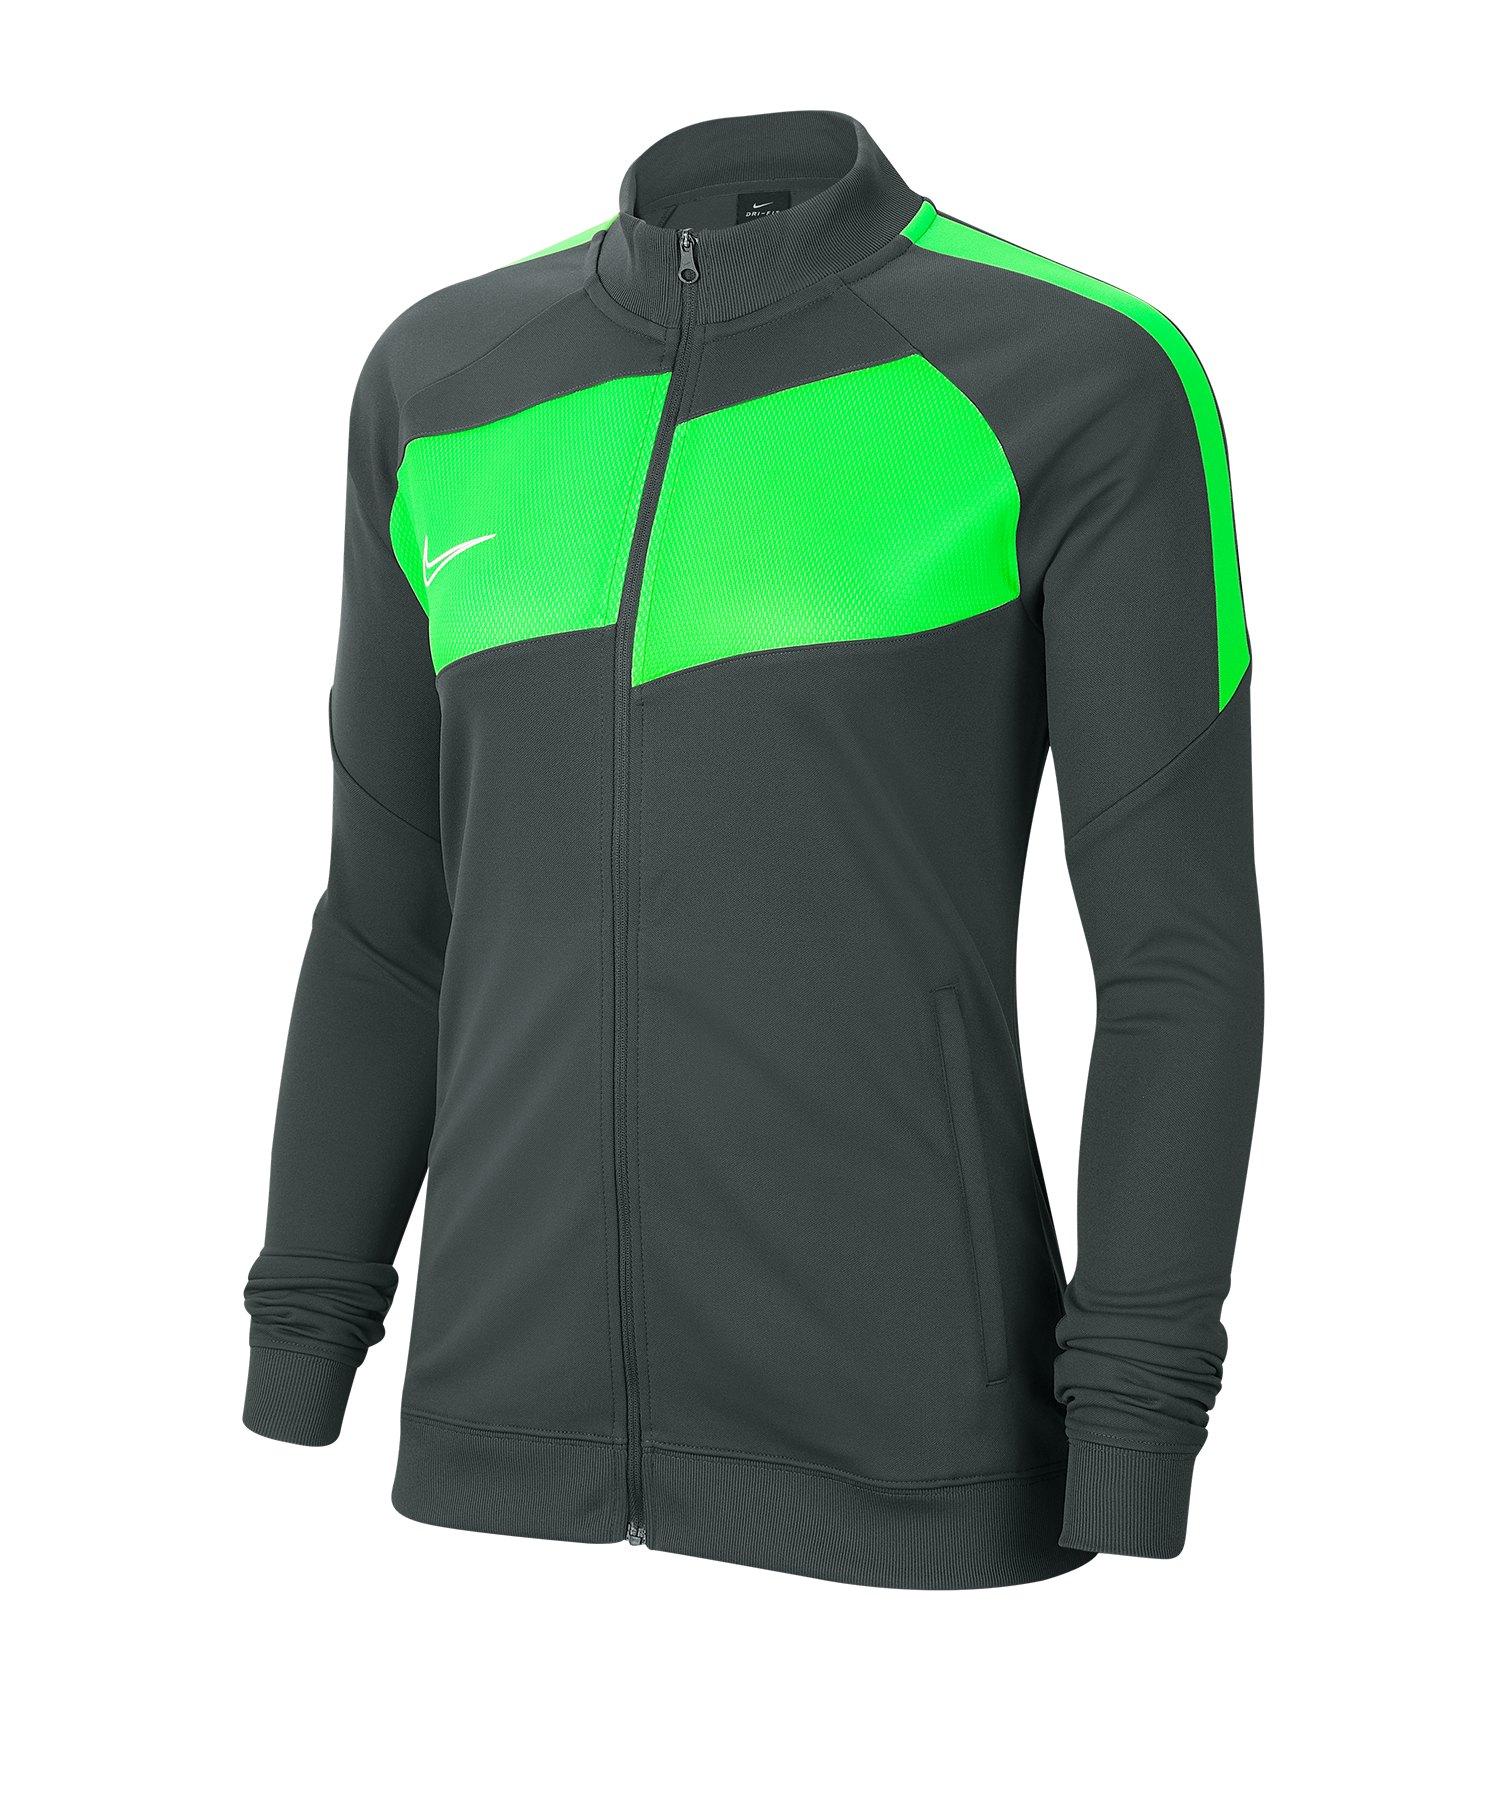 Nike Academy Pro Jacke Damen Grau Grün F061 - grau